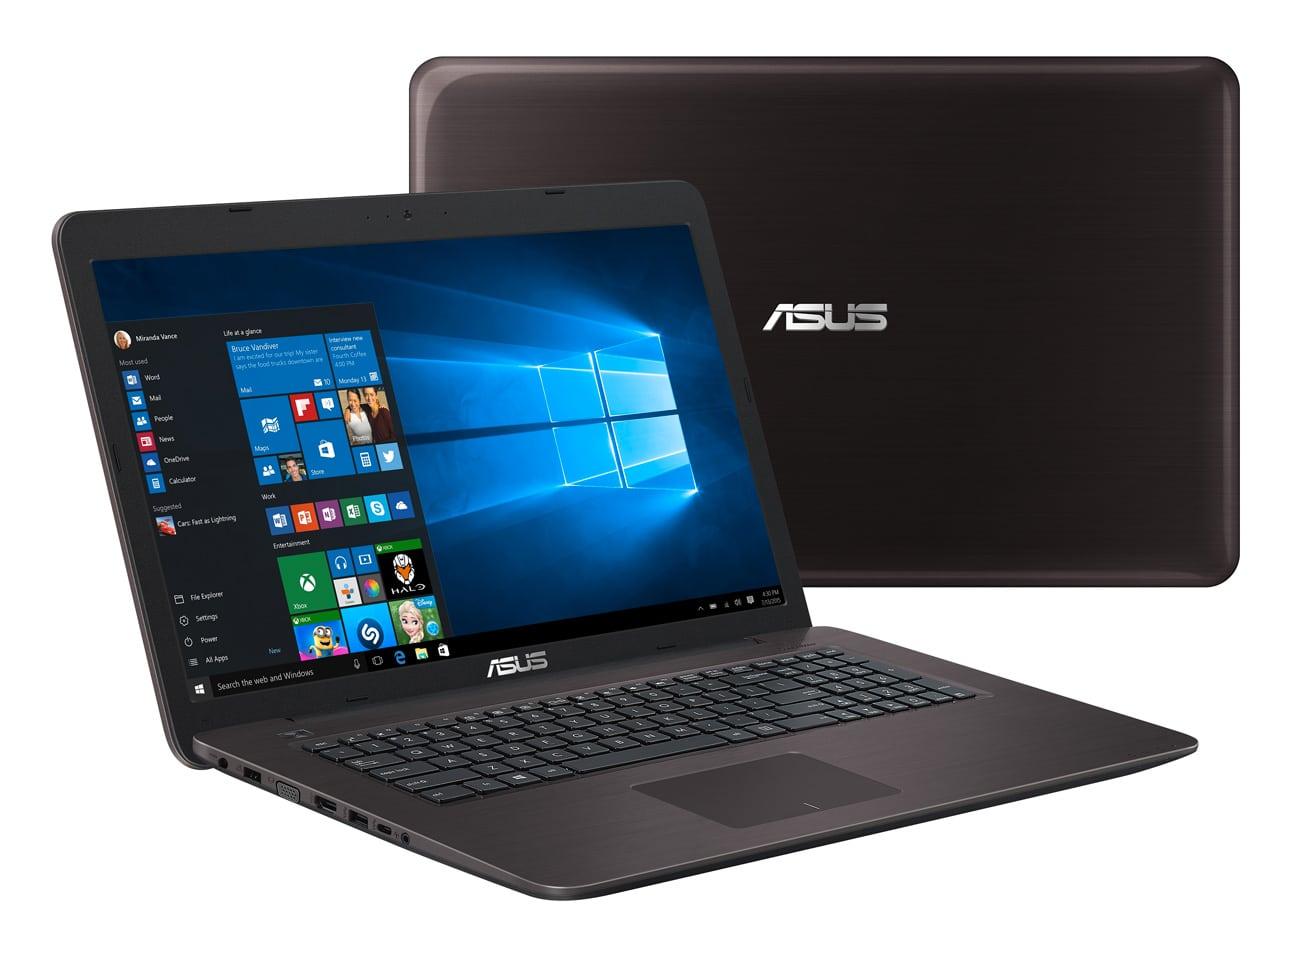 Asus R753UX-T4296T, PC portable 17 pouces i7 Kaby 950M Full HD à 999€